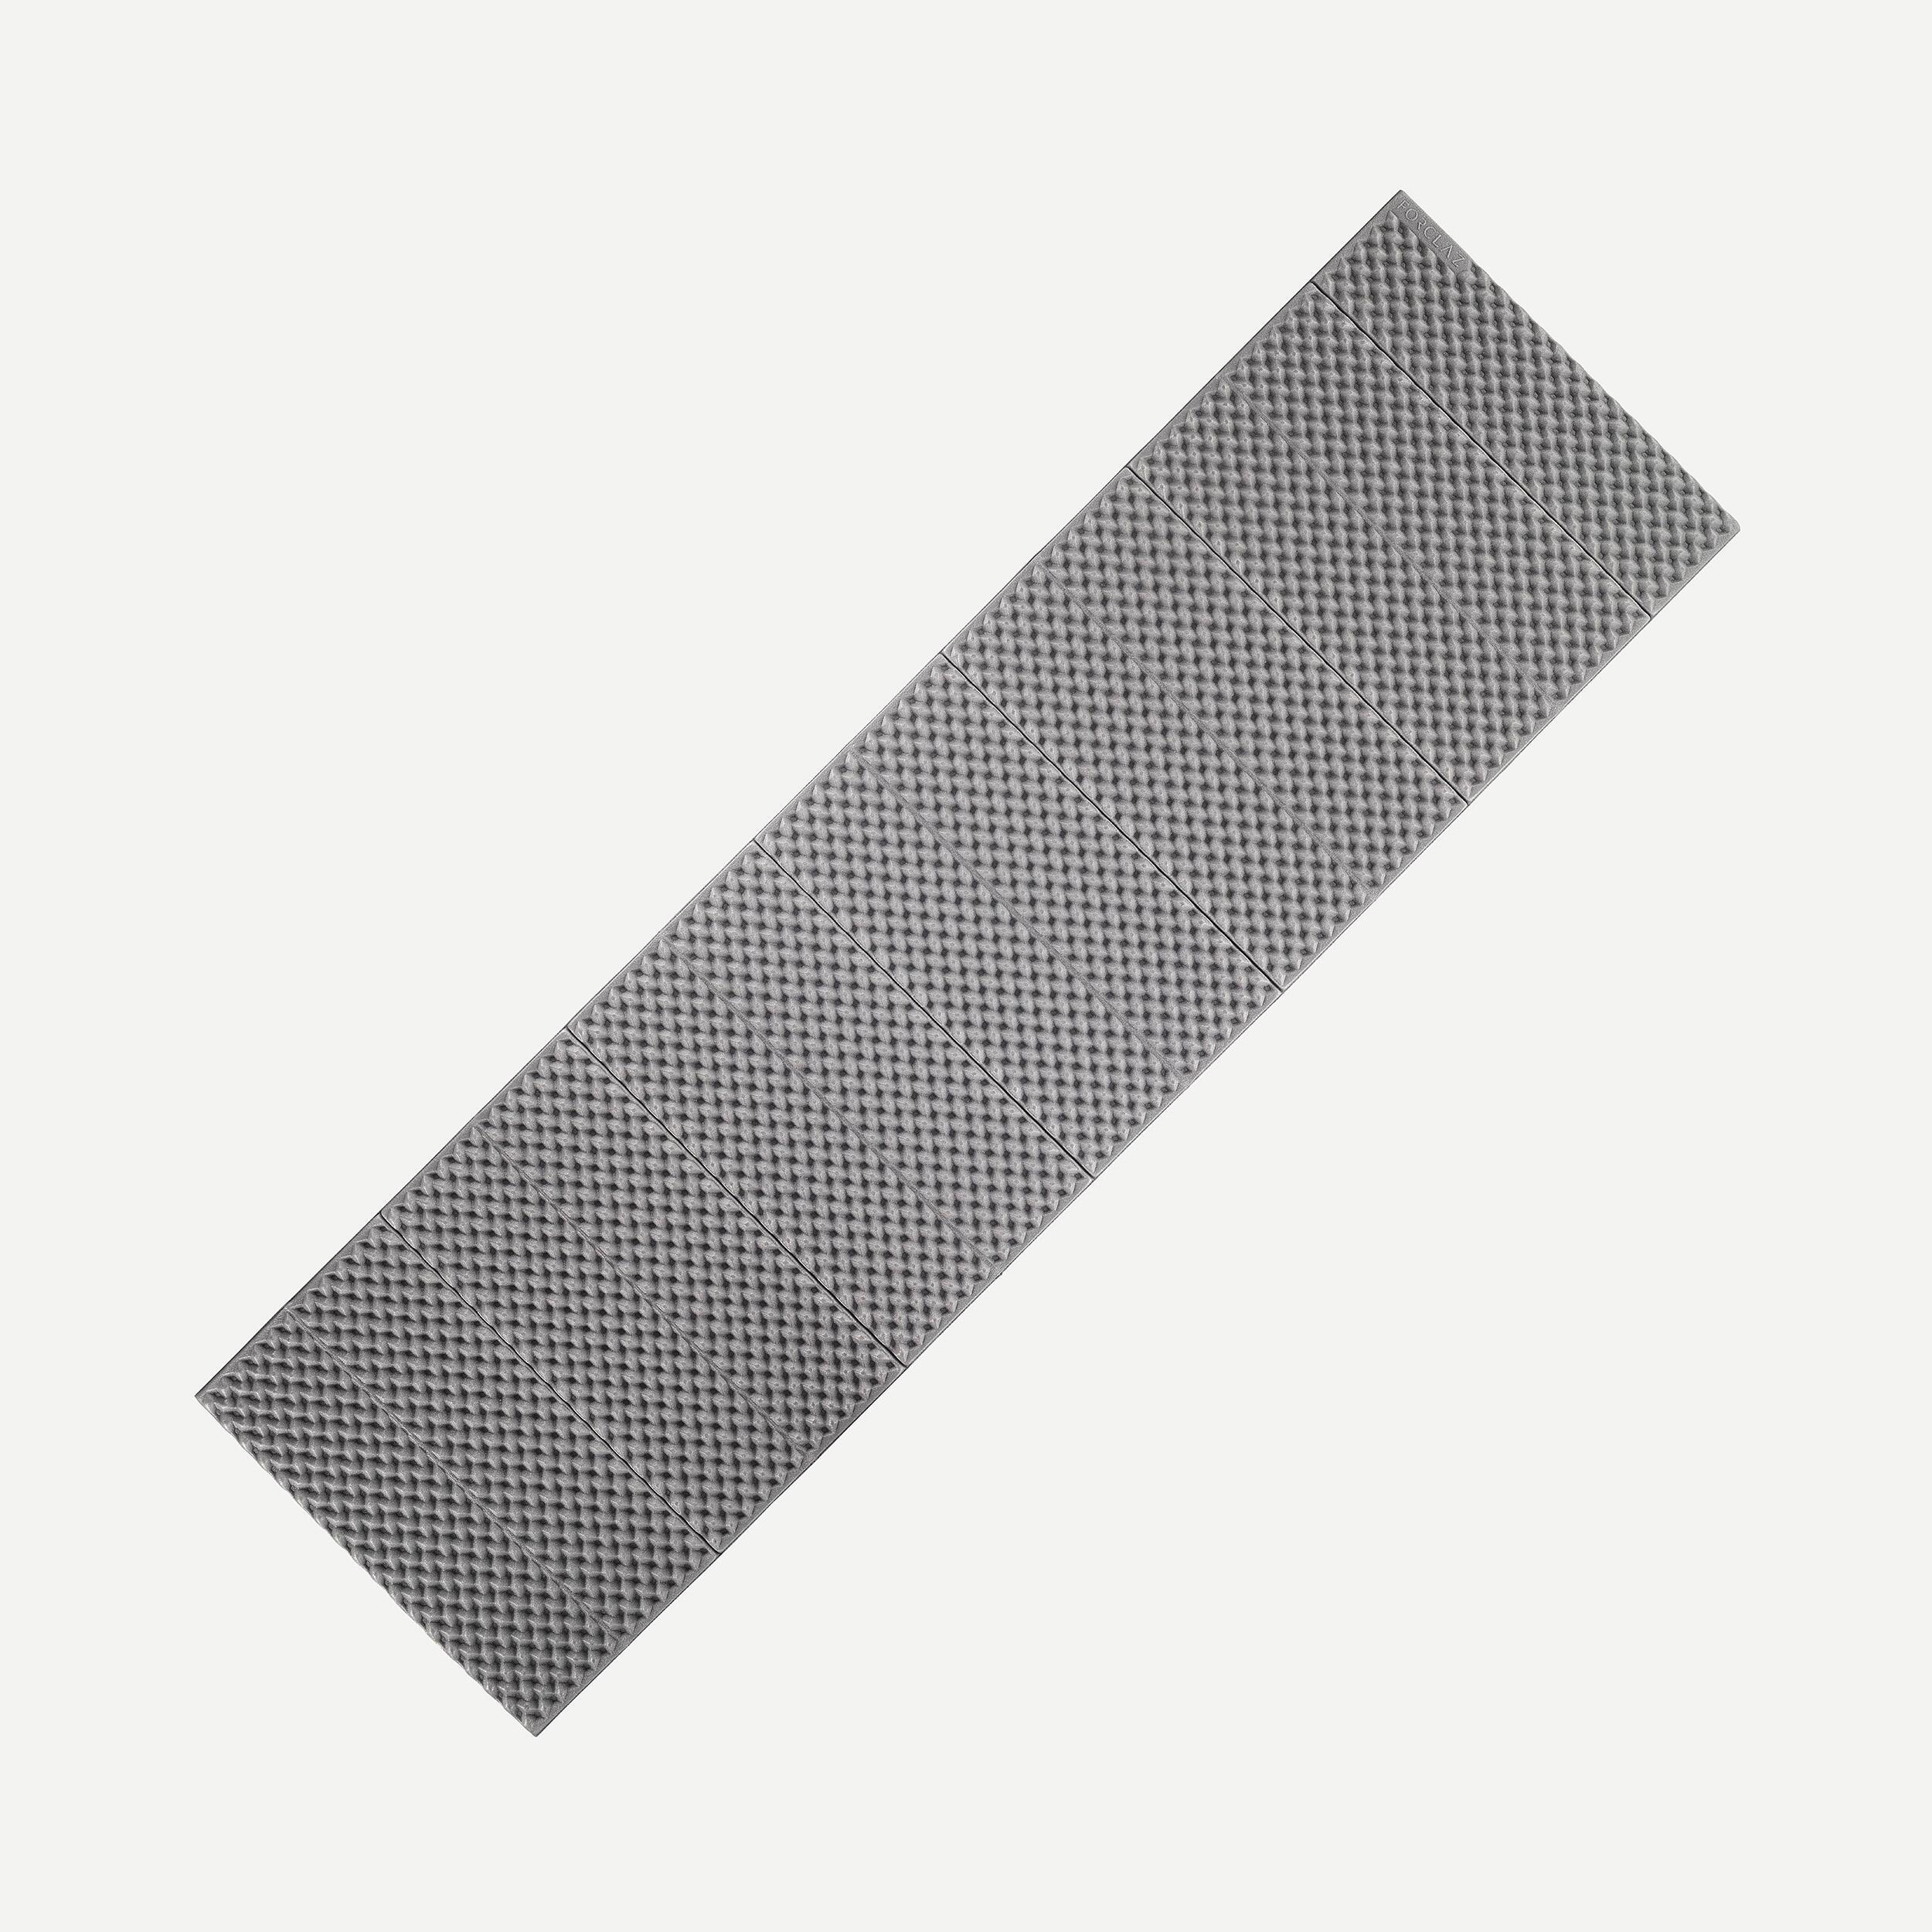 Isomatte Trek 100 Schaumstoff faltbar 180 cm grau